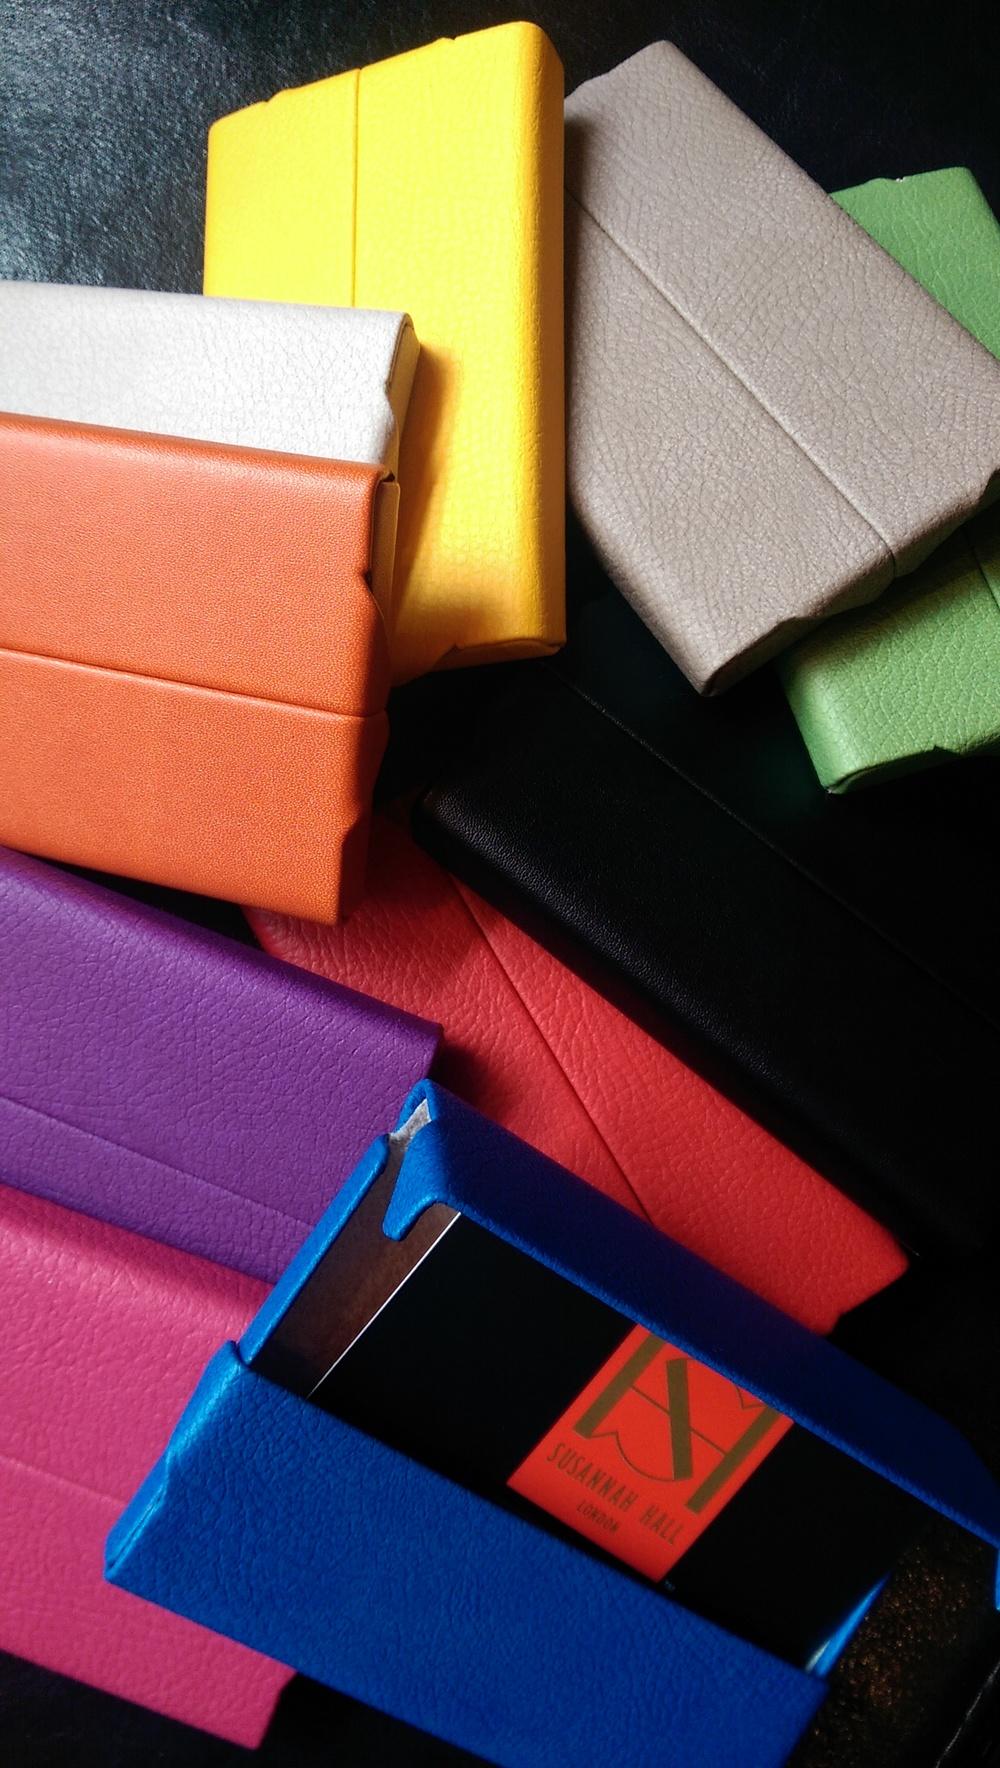 georgio-fedon-coloured-cardholders.jpg